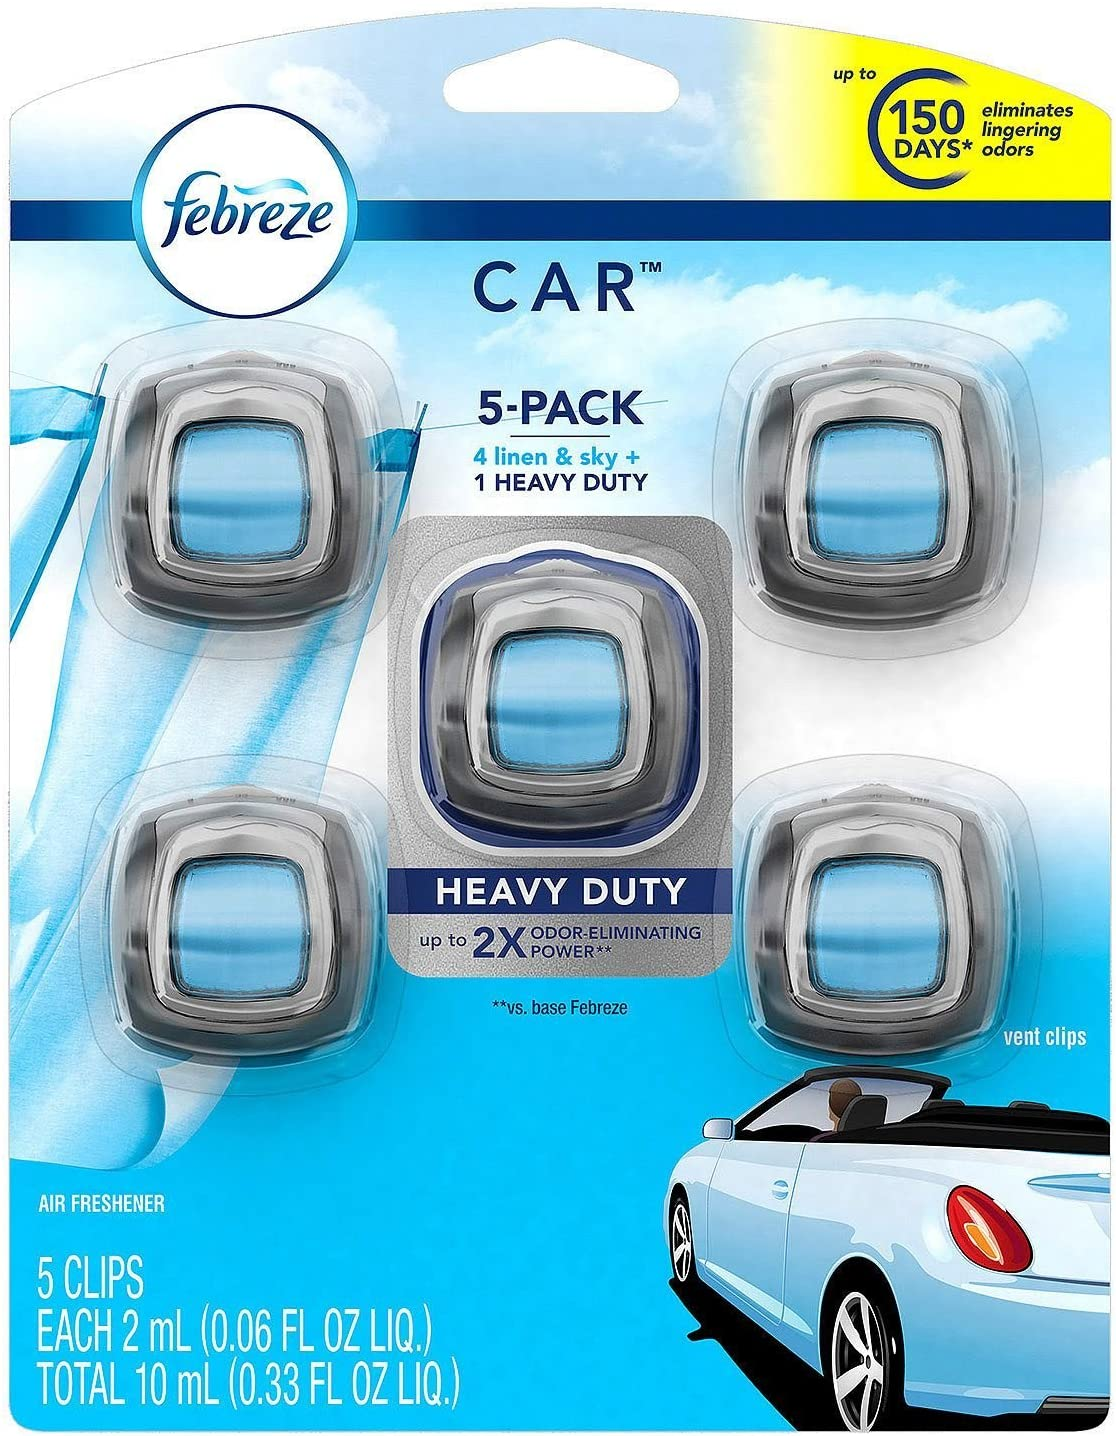 Febreze Car Air Freshener, Set of 5 Clips, 4 Linen and Sky, 1 Heavy Duty